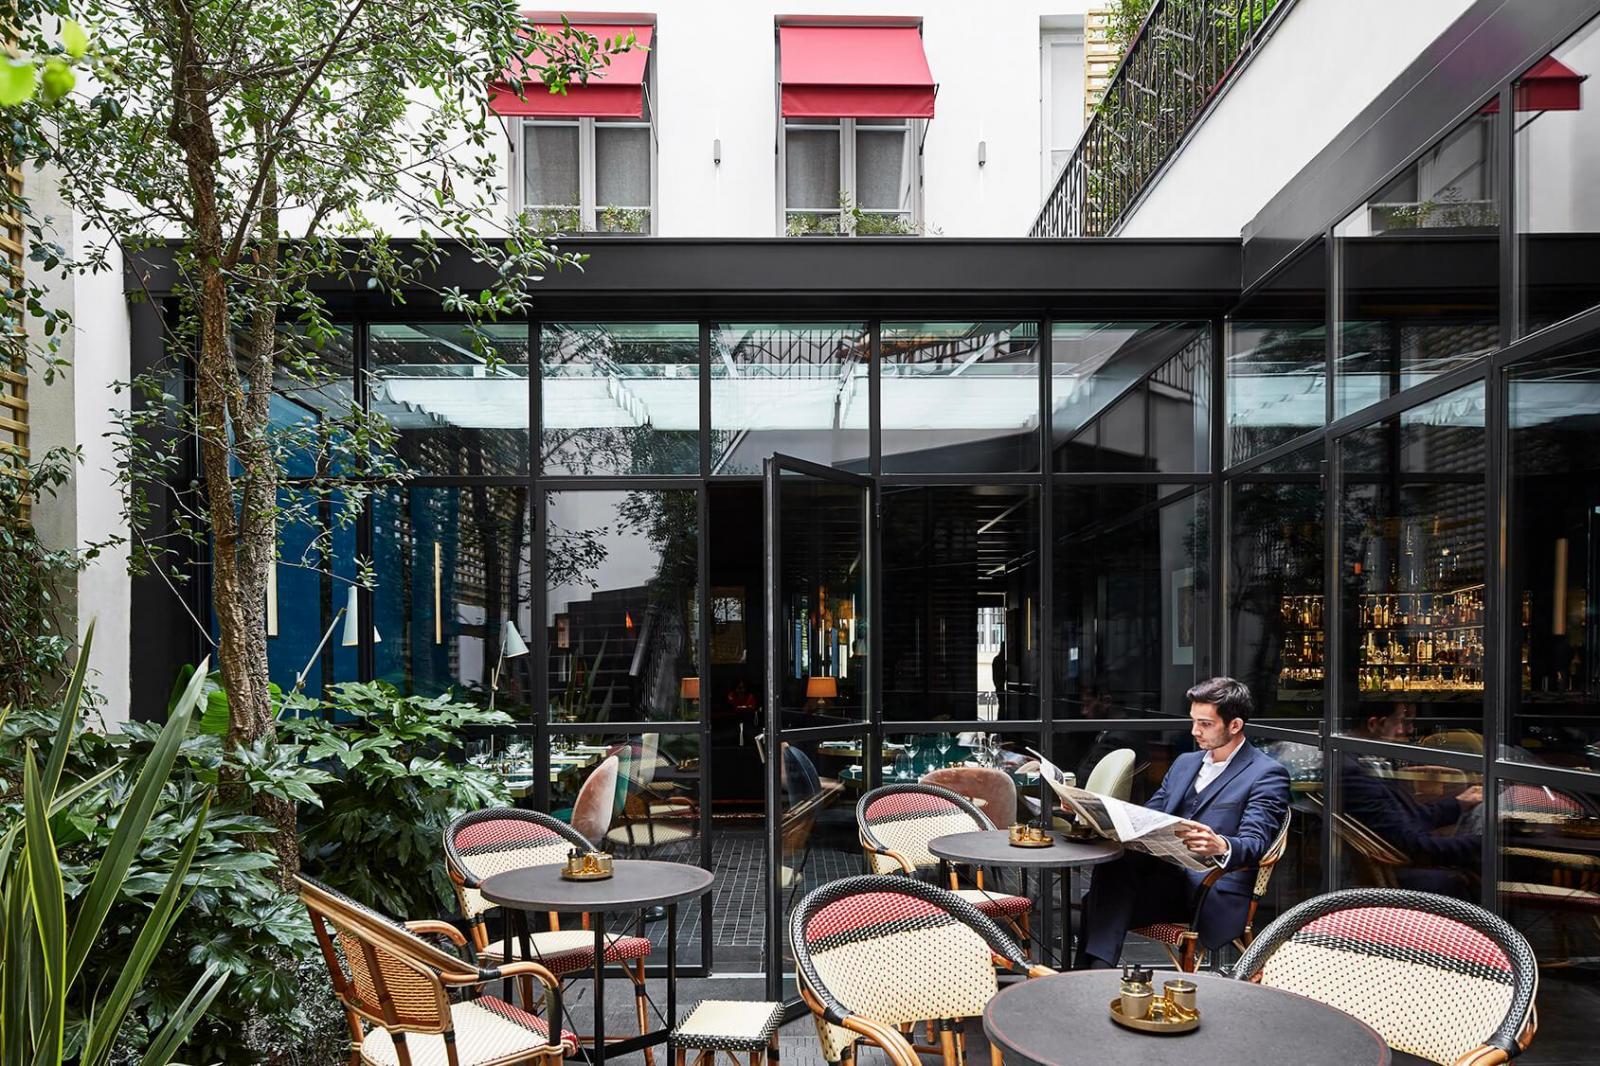 Restaurant Rue Saint Roch